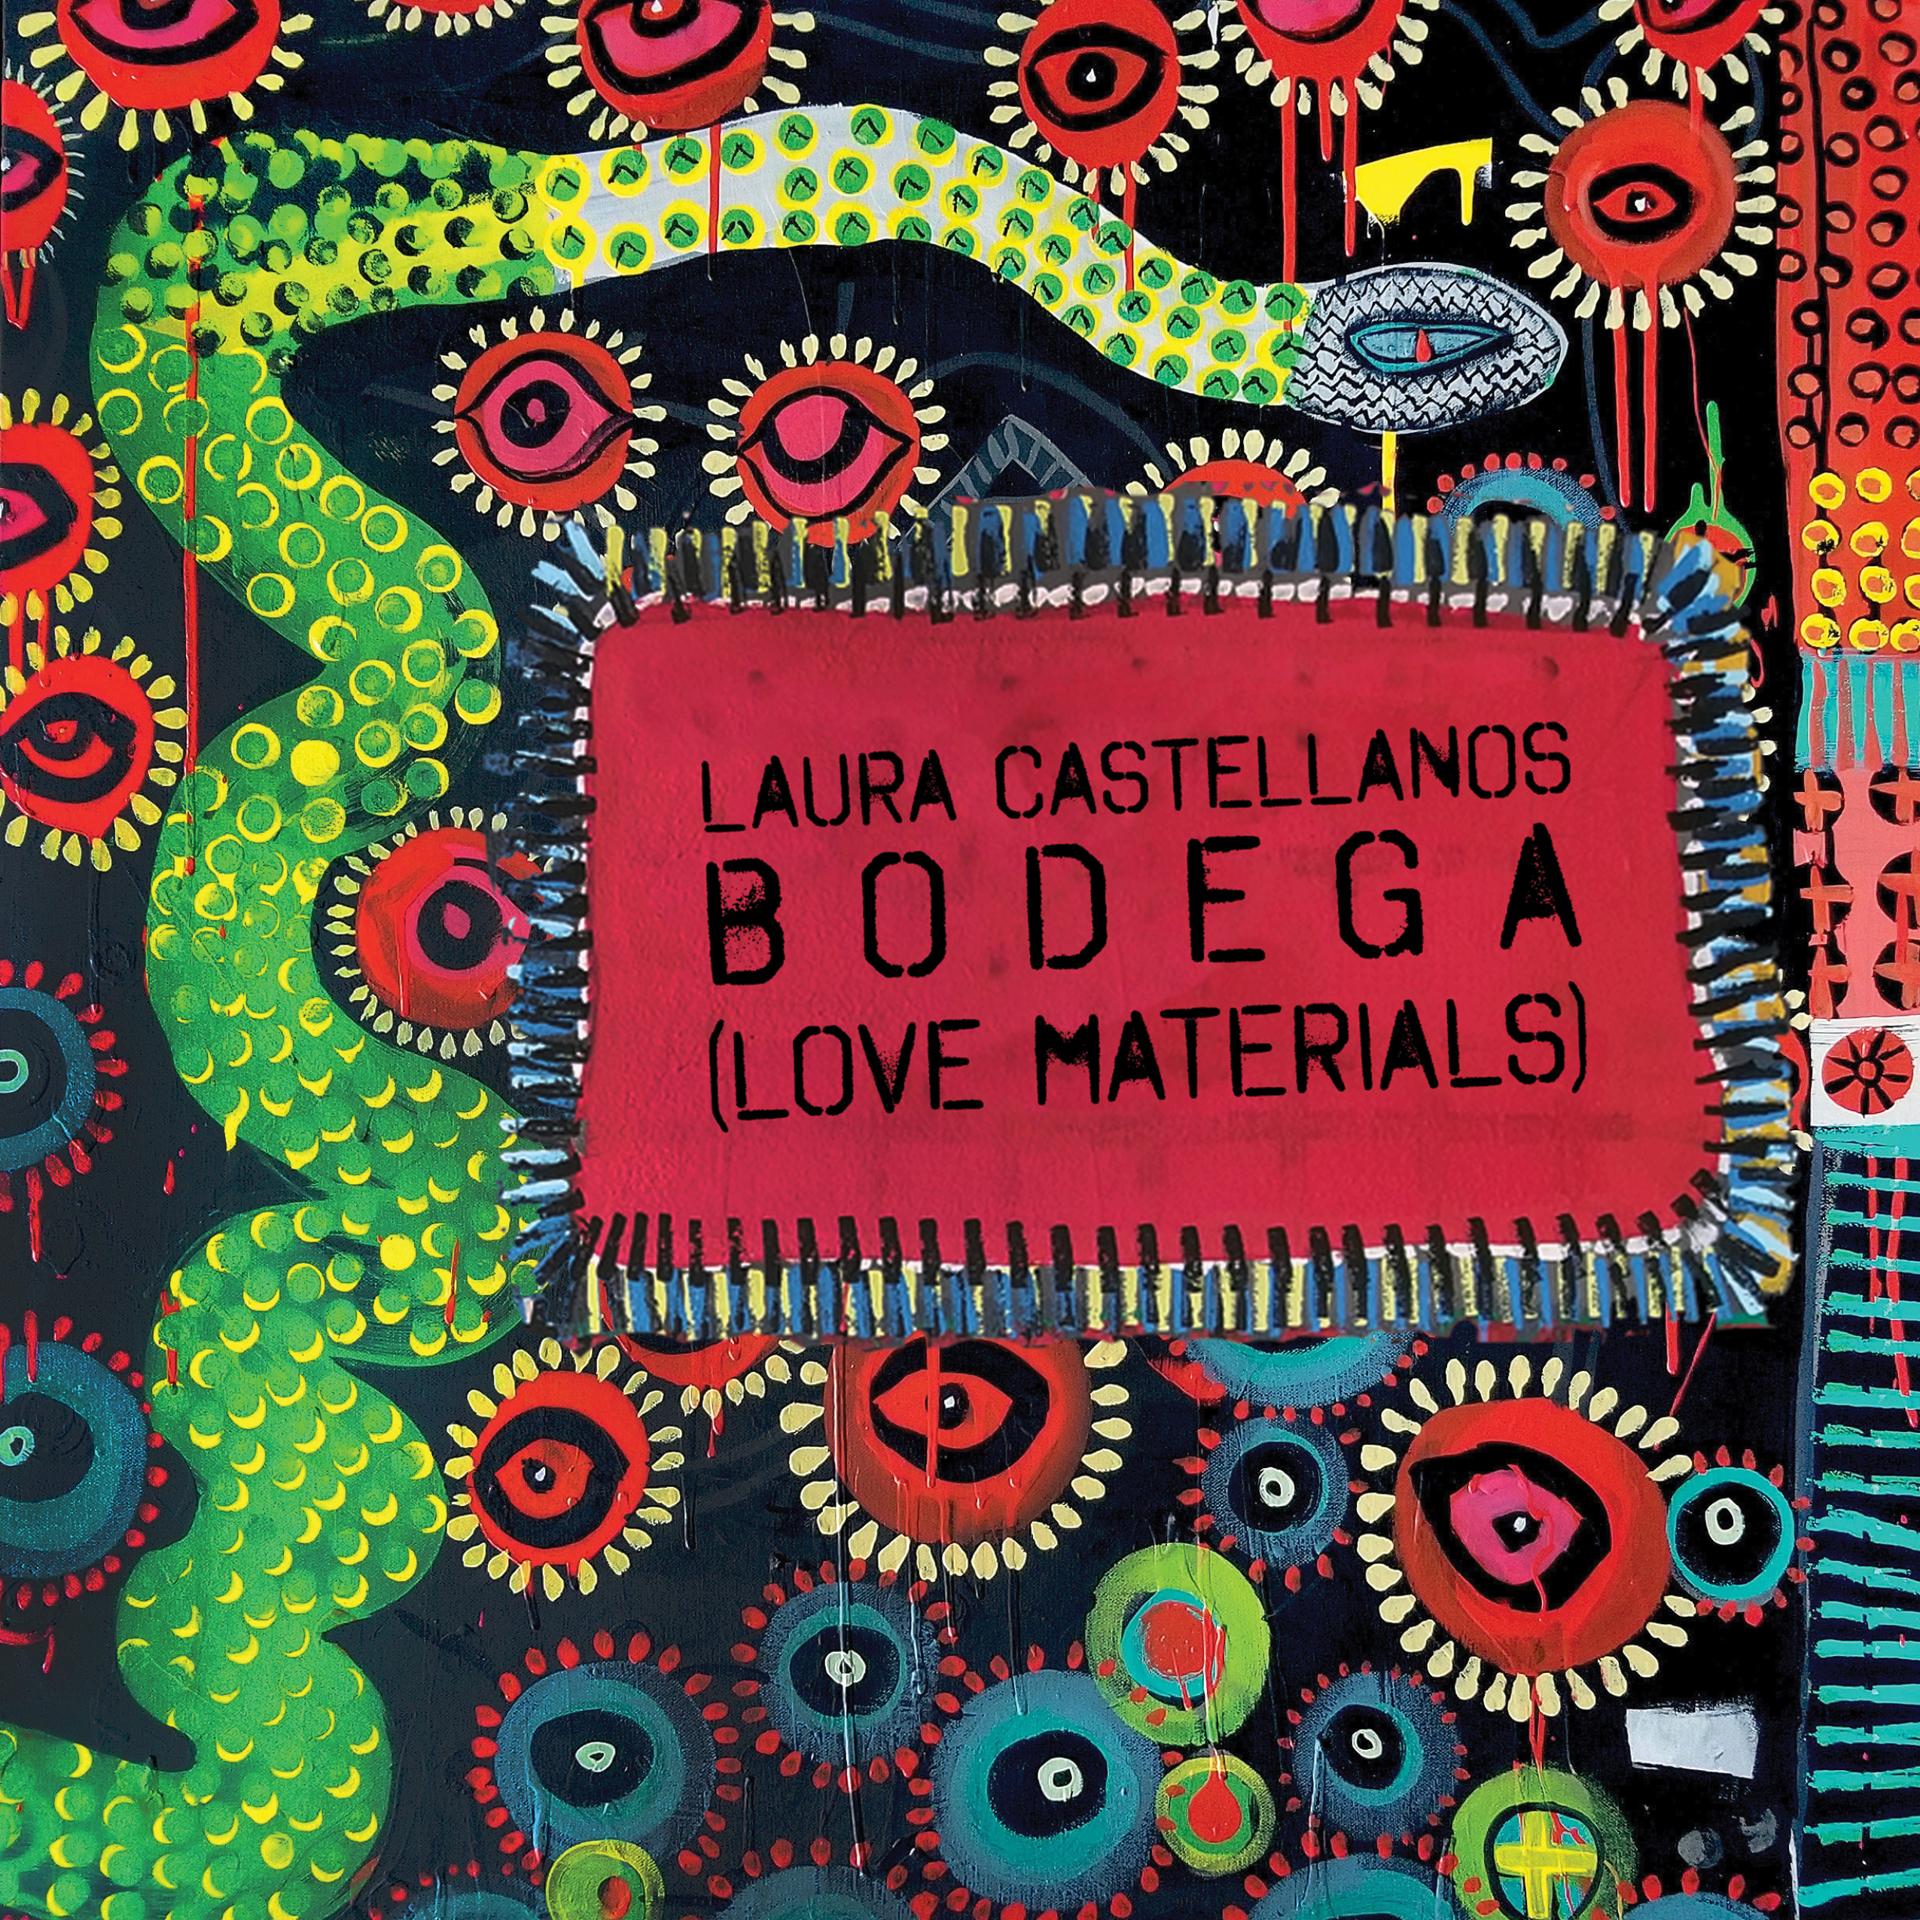 BODEGA (Love Materials)   exhibition catalog by Laura Castellanos